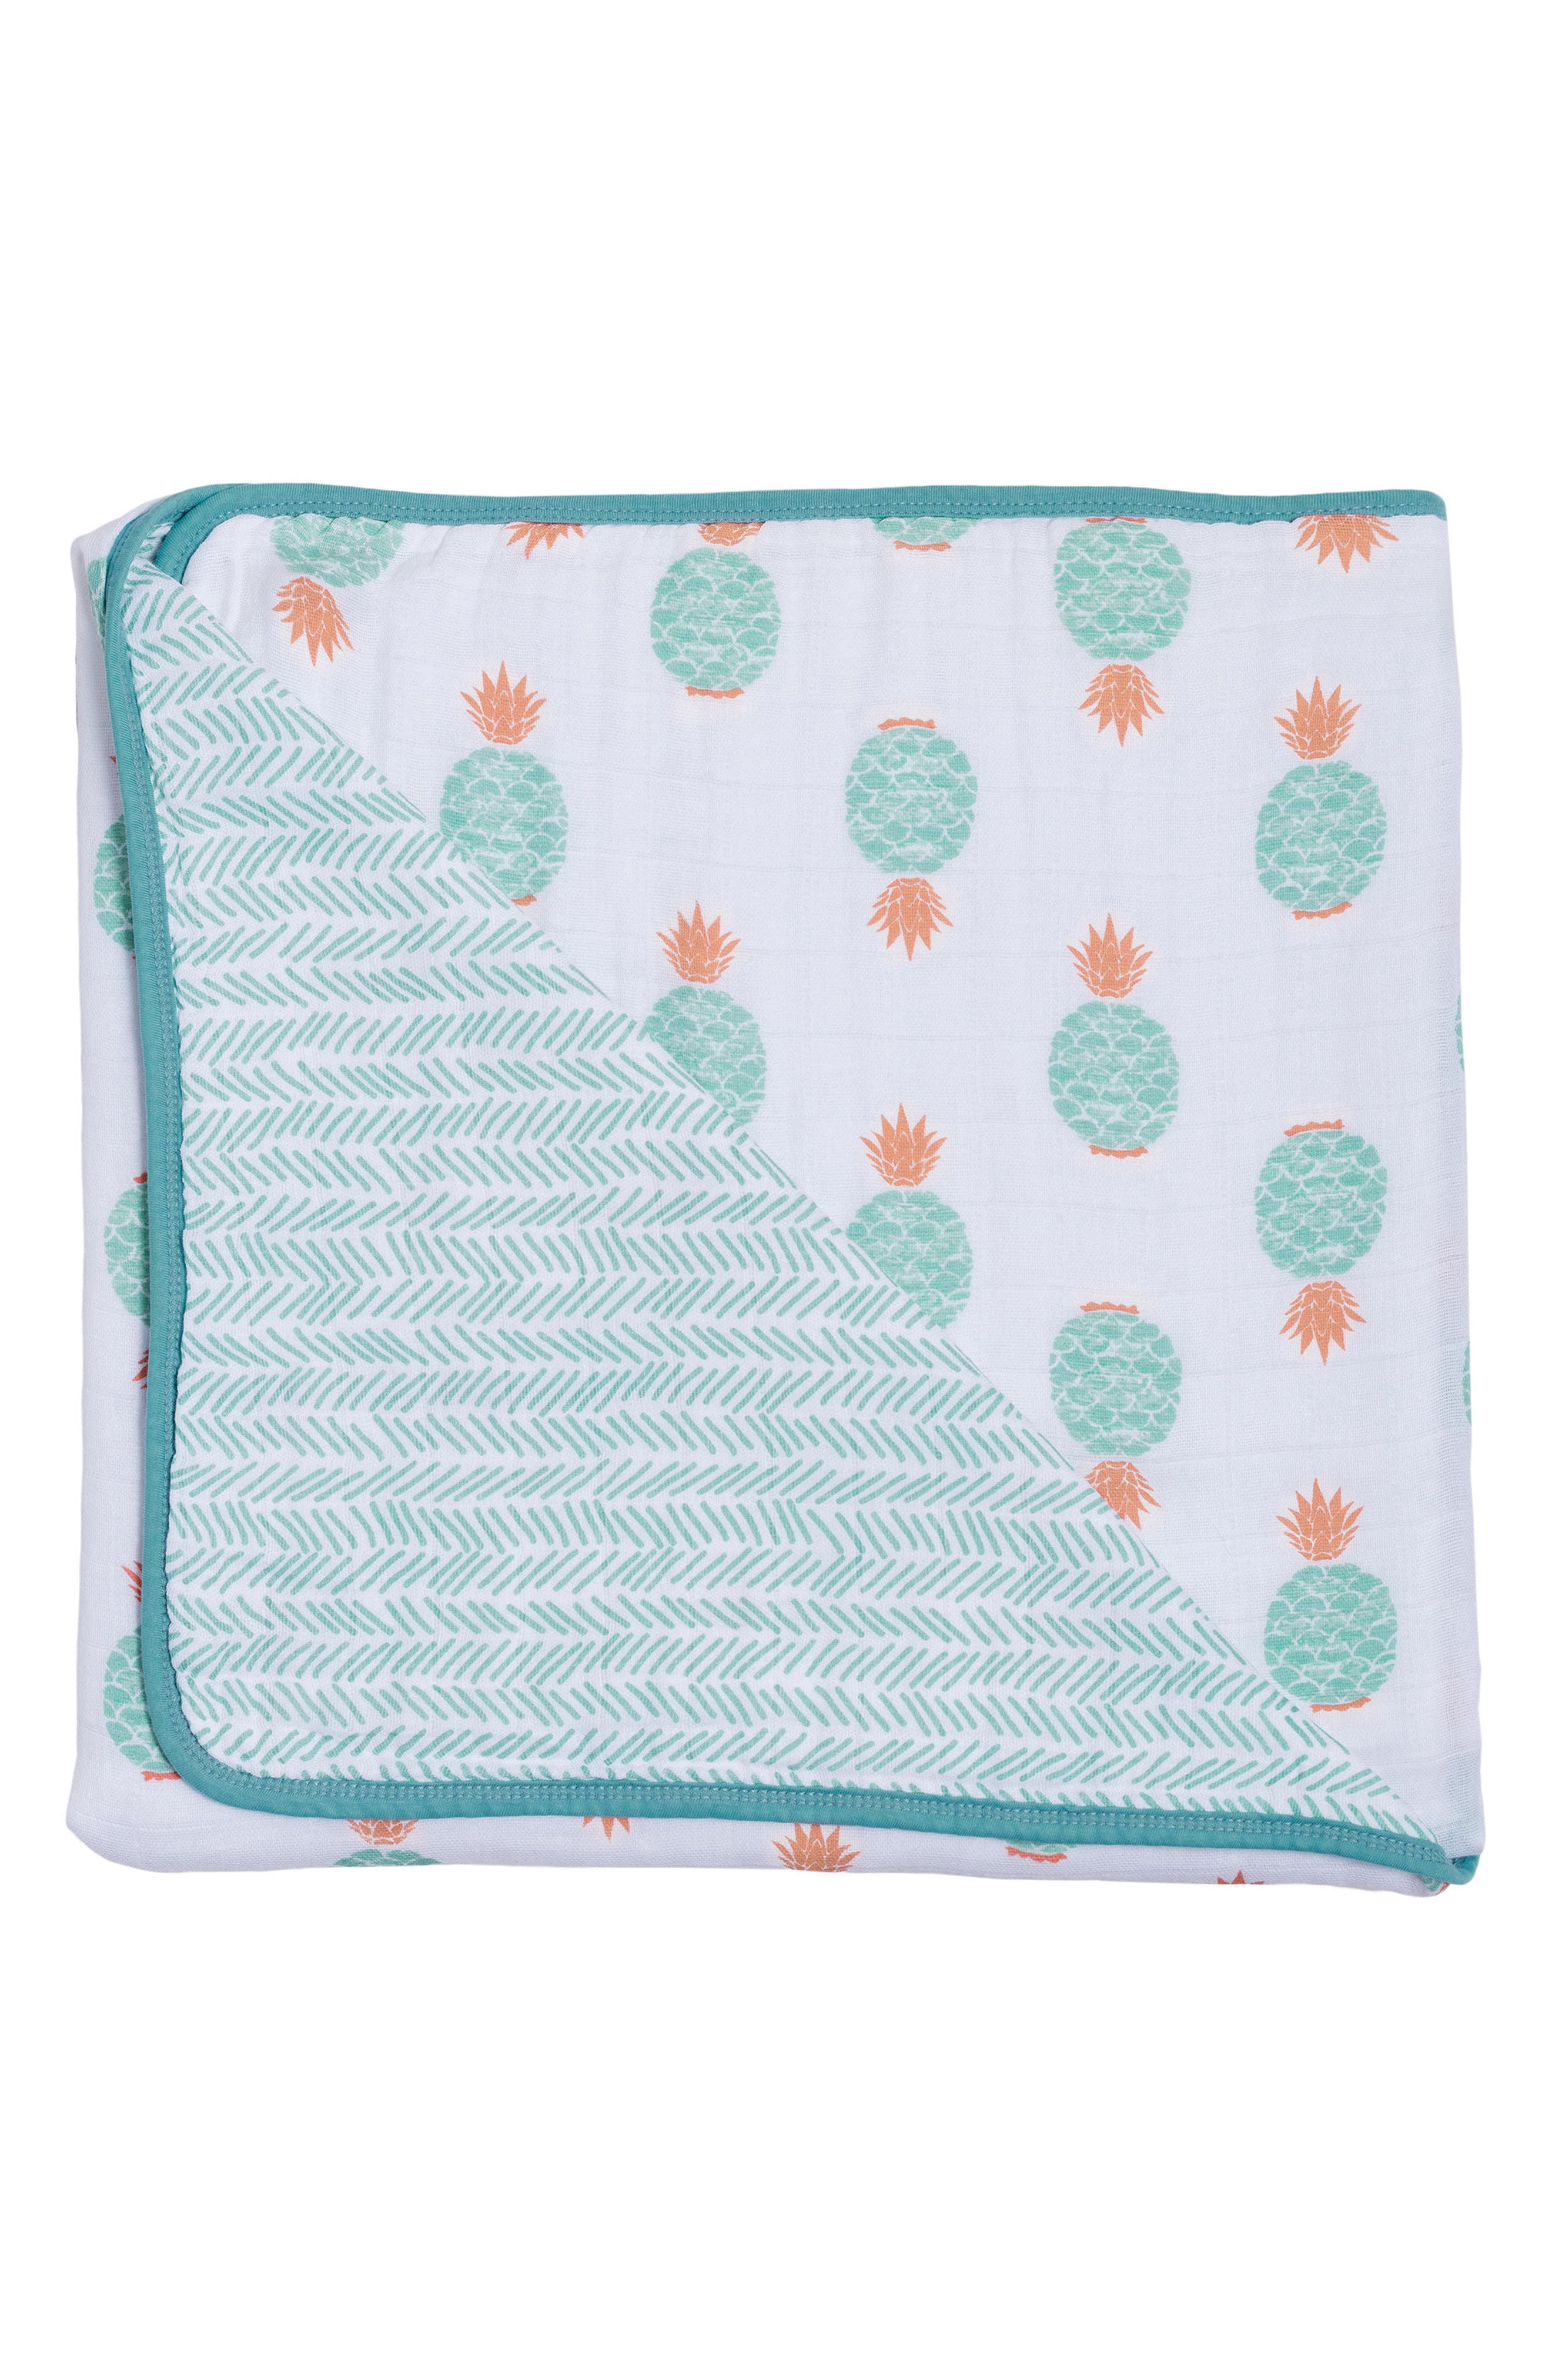 Cotton Muslin Blanket,                         Main,                         color, 340